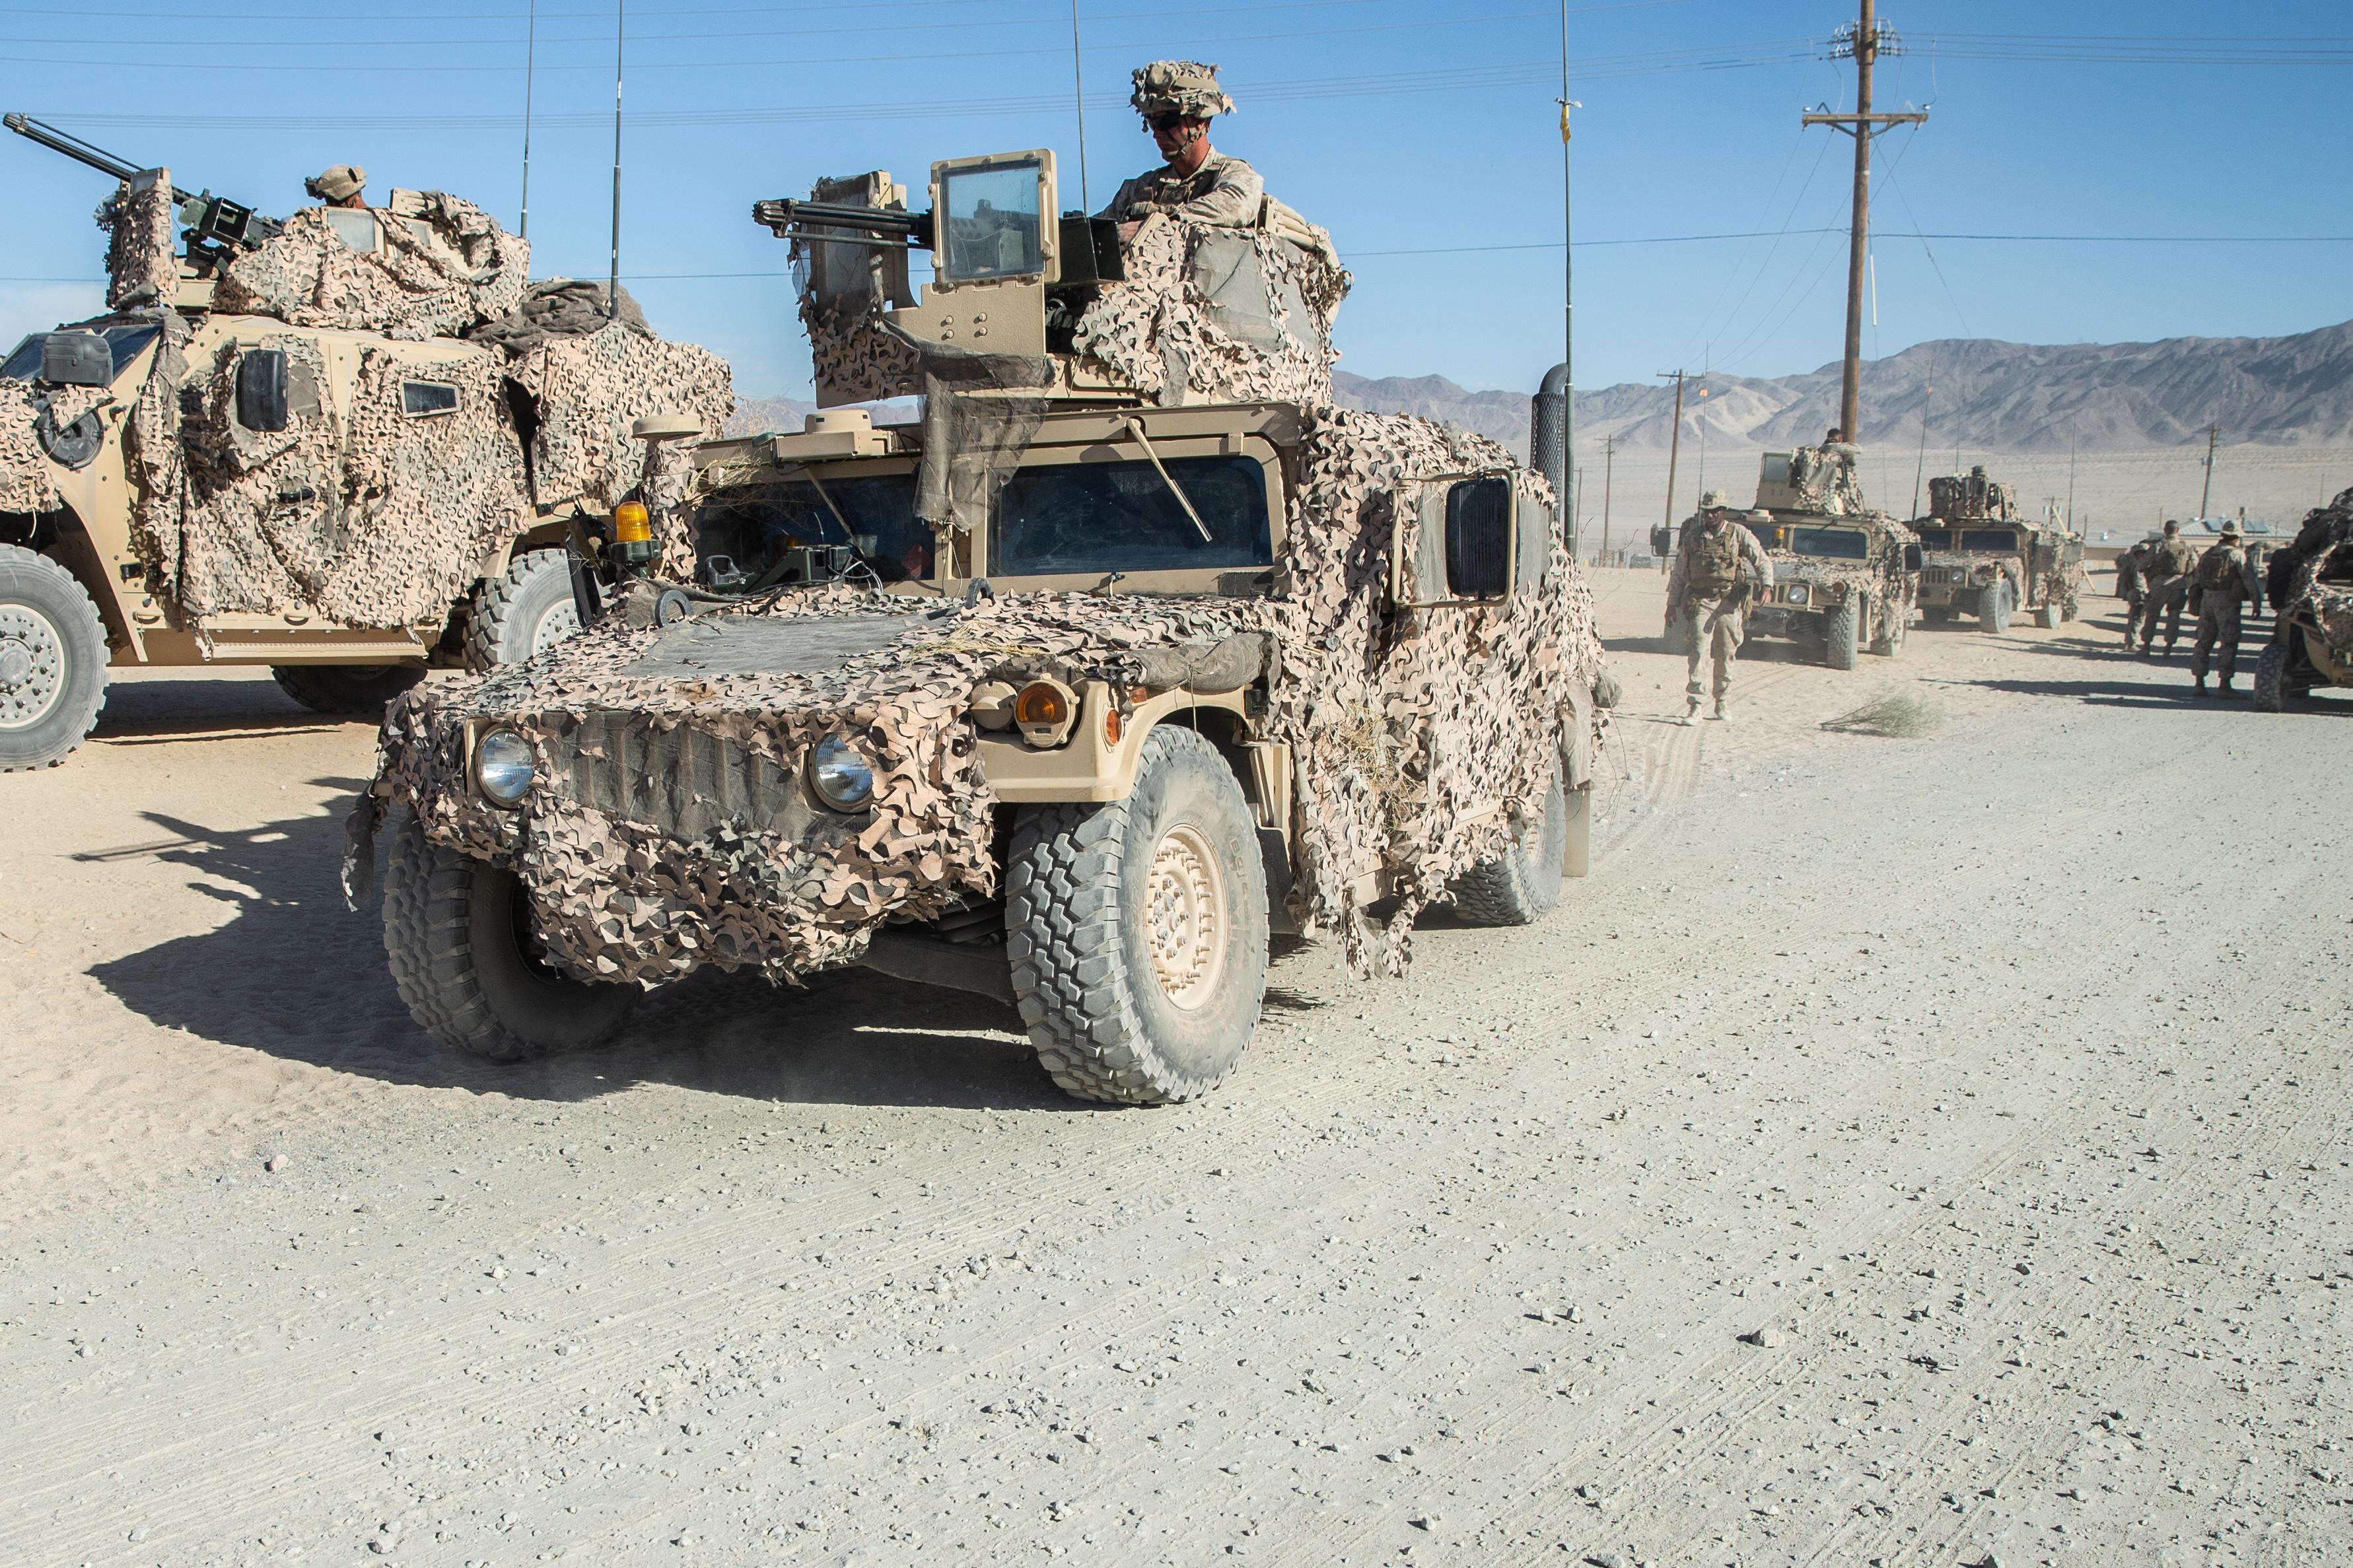 U.S. Marines with 2nd Marine Division Participate in MWX – Nov 06, 2019